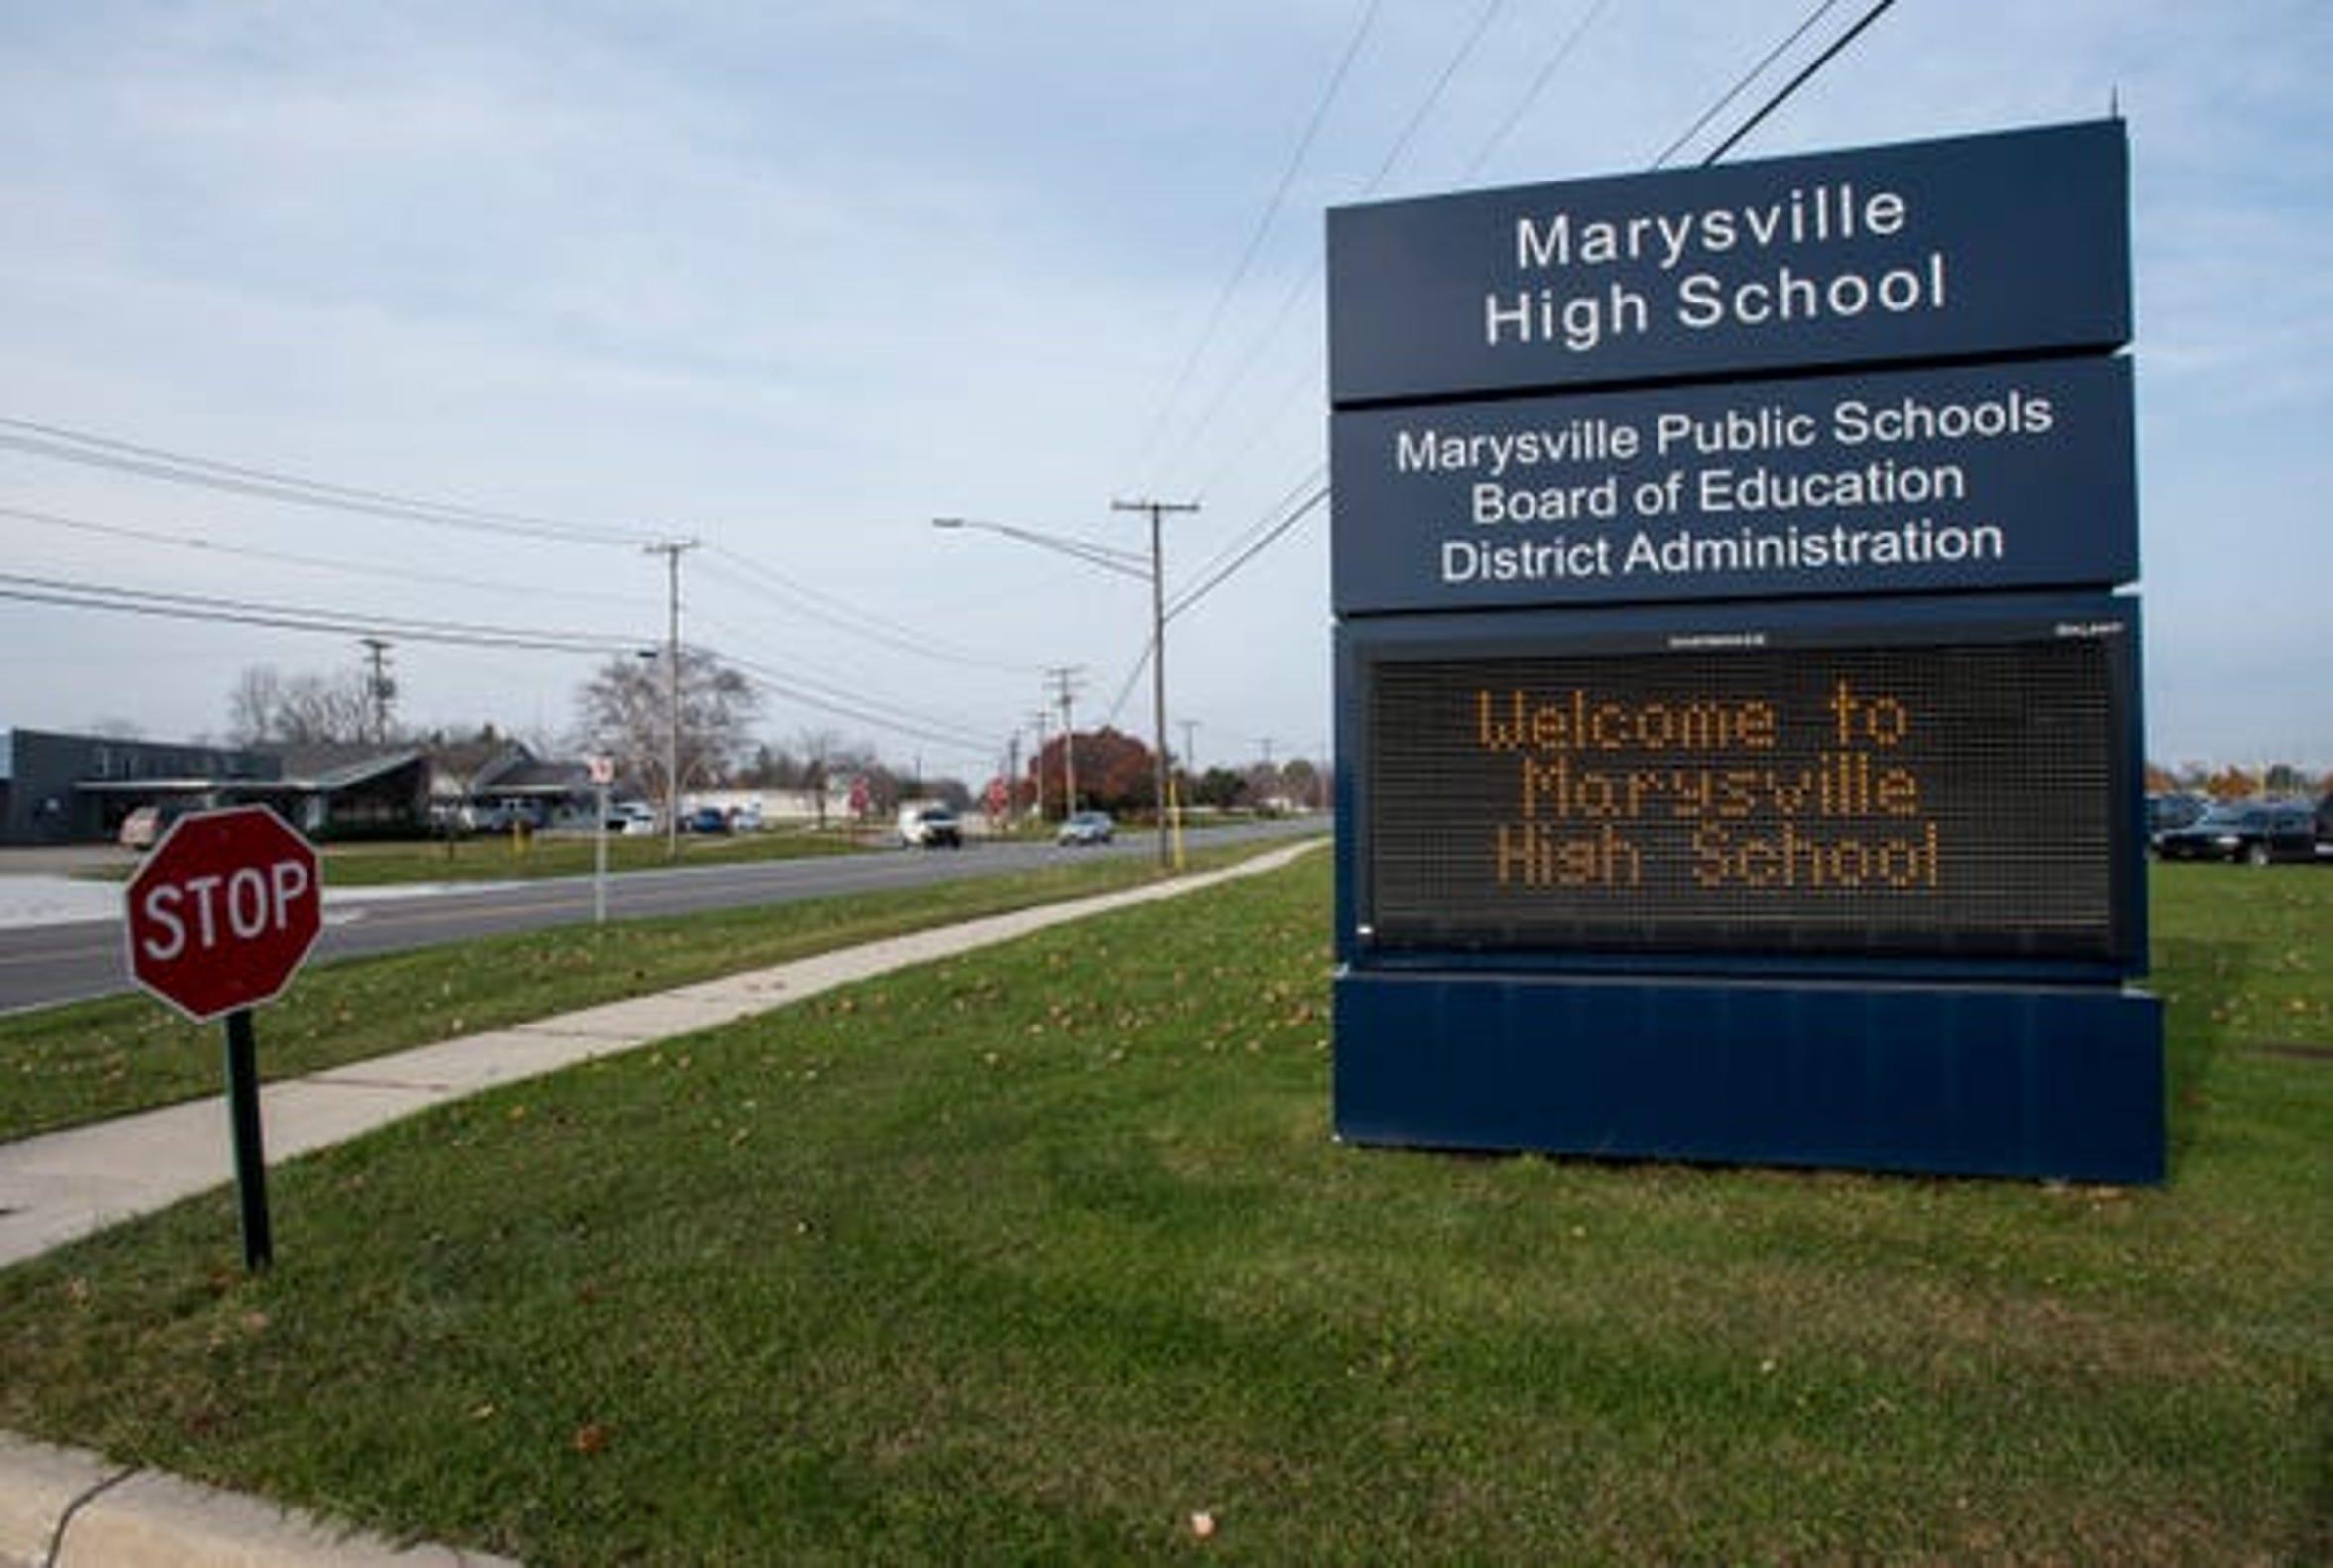 Marysville High School.